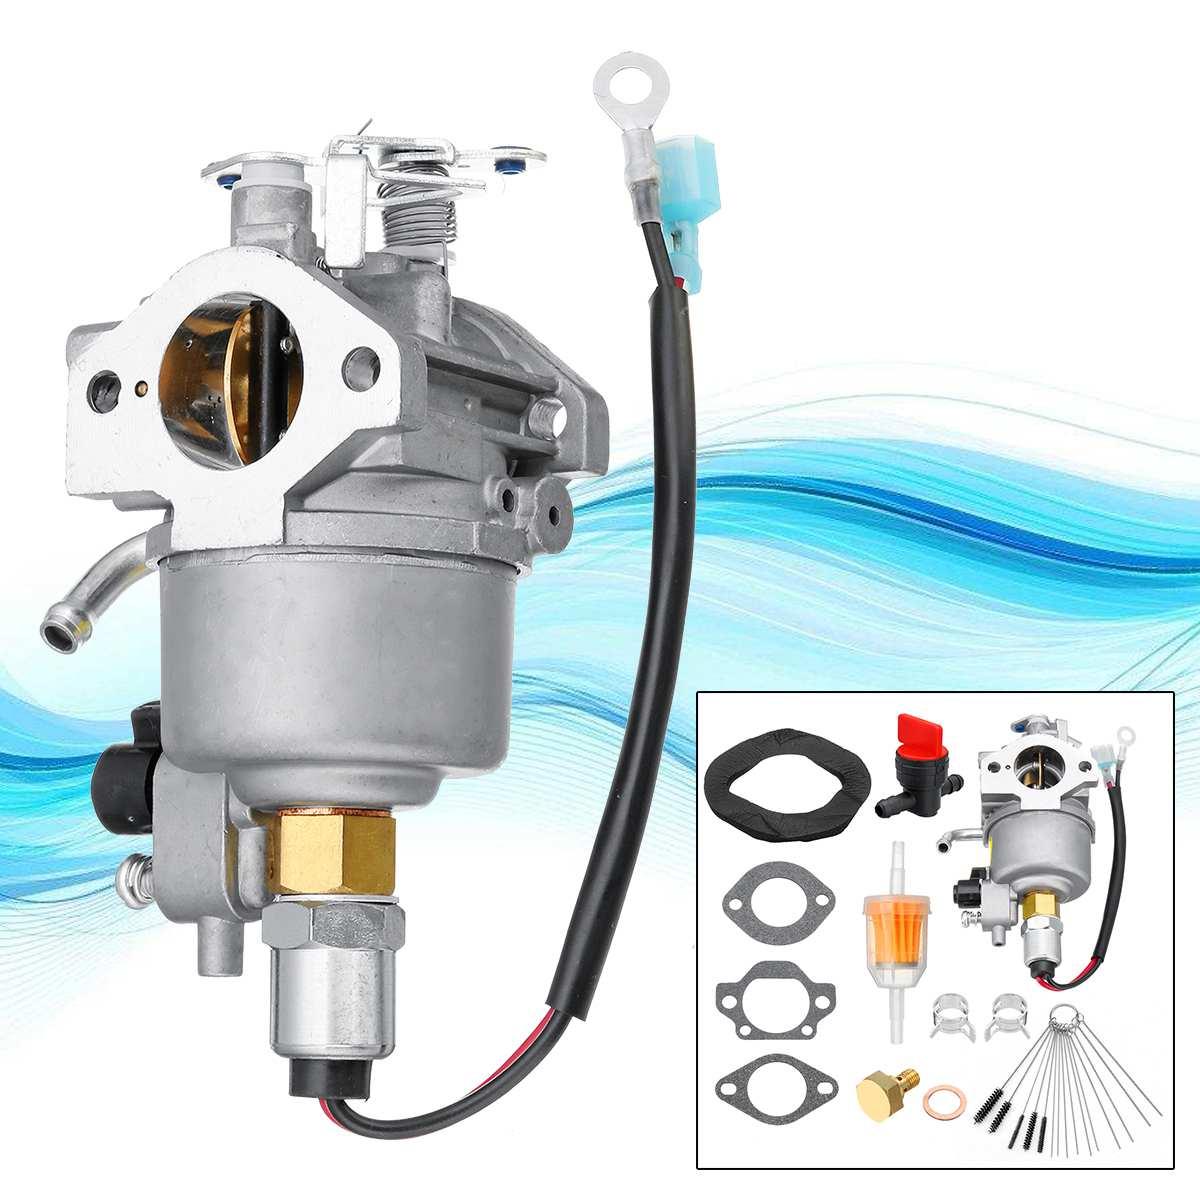 hight resolution of carburetor rebuild kit replaces onan kit a041d736 for onan engine model onan marvel schebler model 4000w 4kyfa26100 in carburetors from automobiles